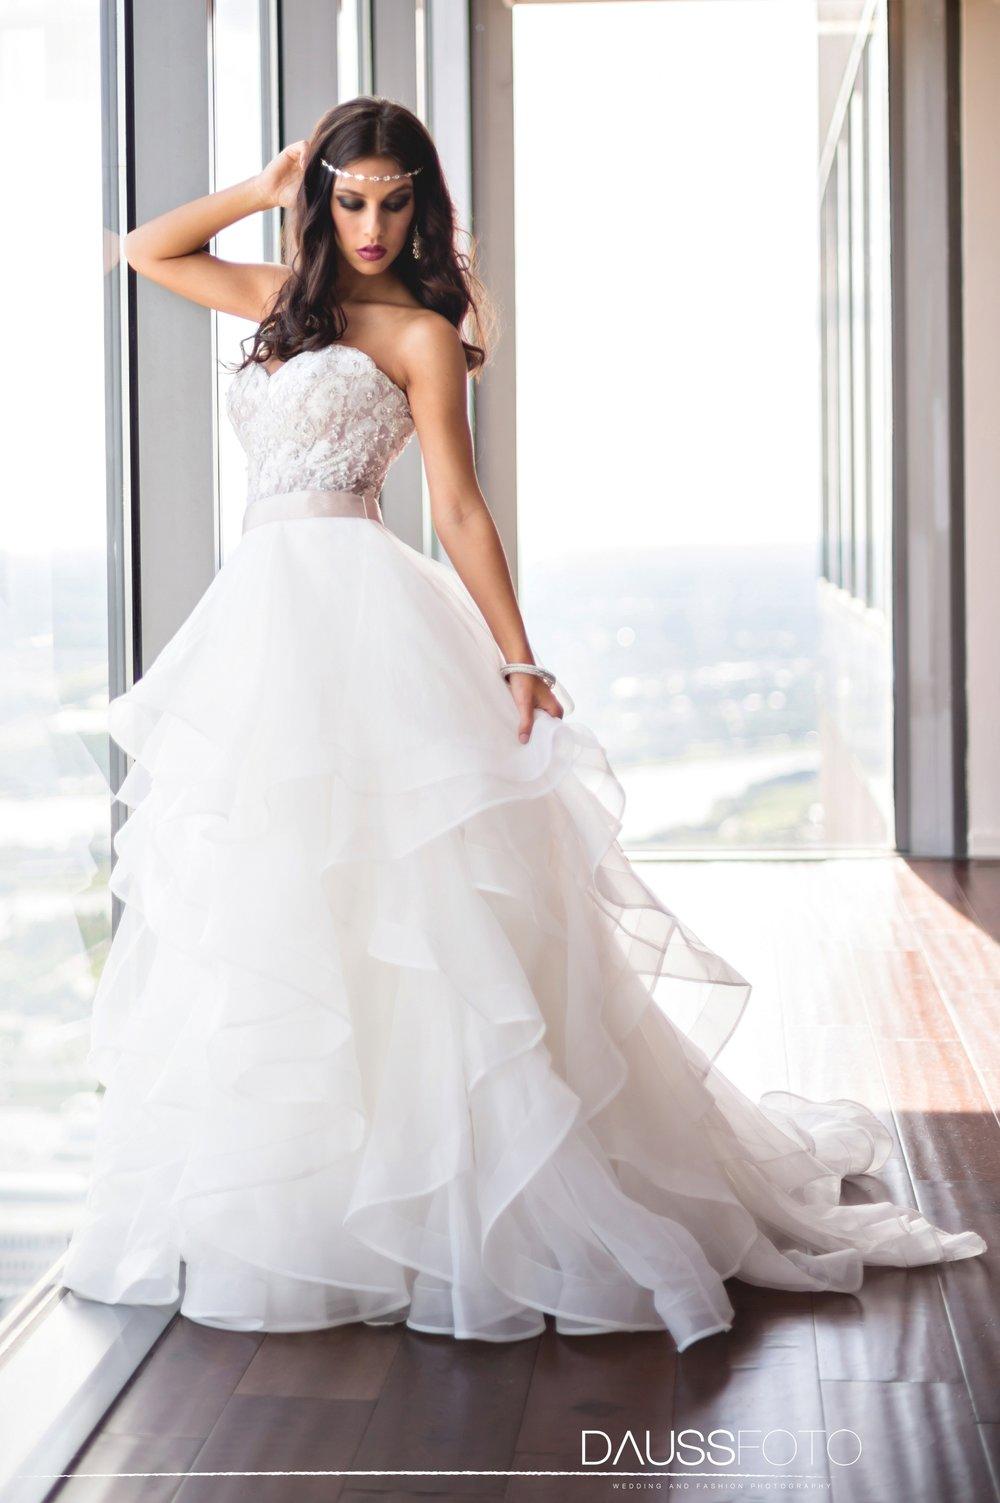 DaussFOTO_20150721_070_Indiana Wedding Photographer.jpg